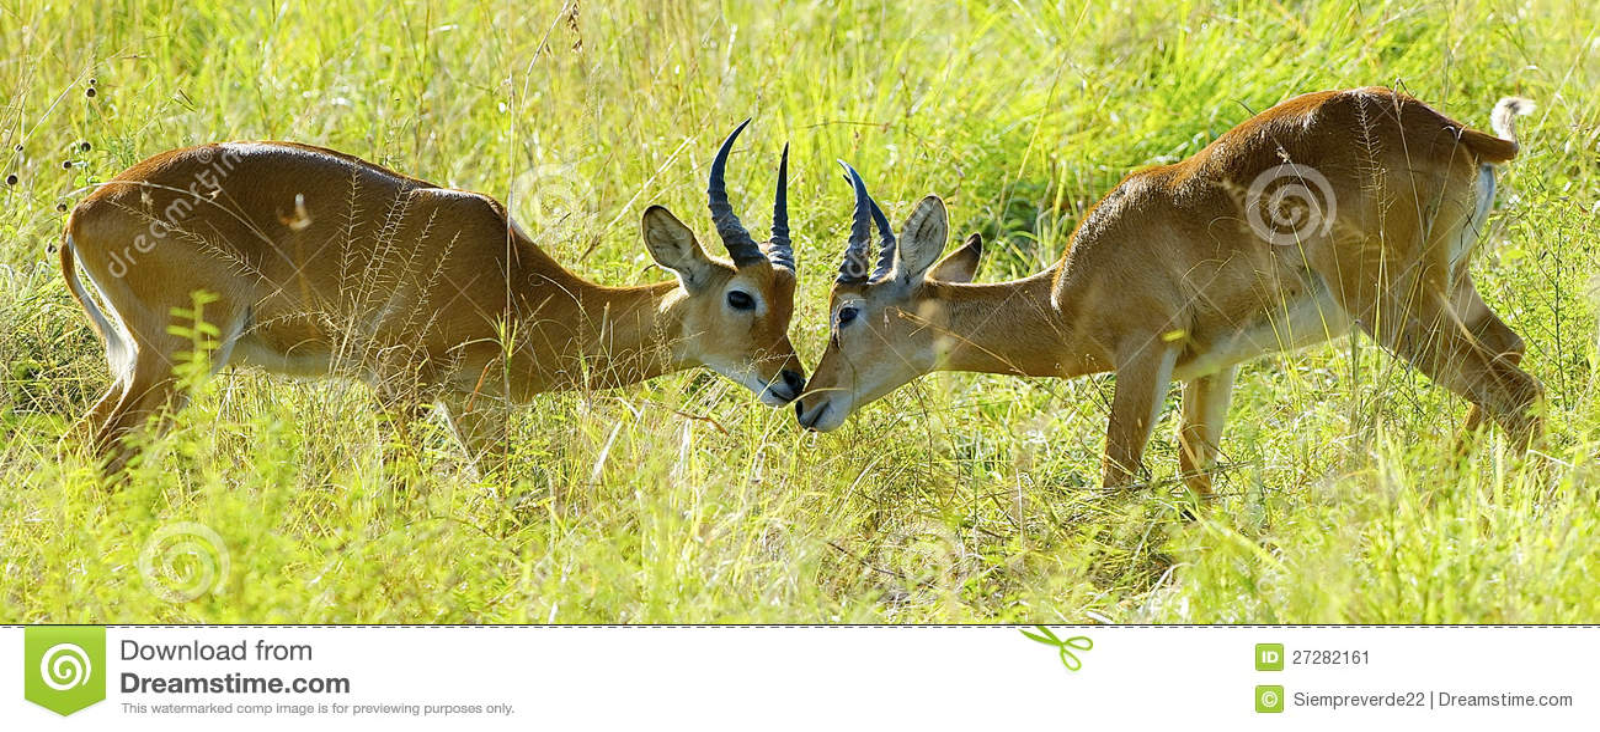 Antilopkamp i fältet